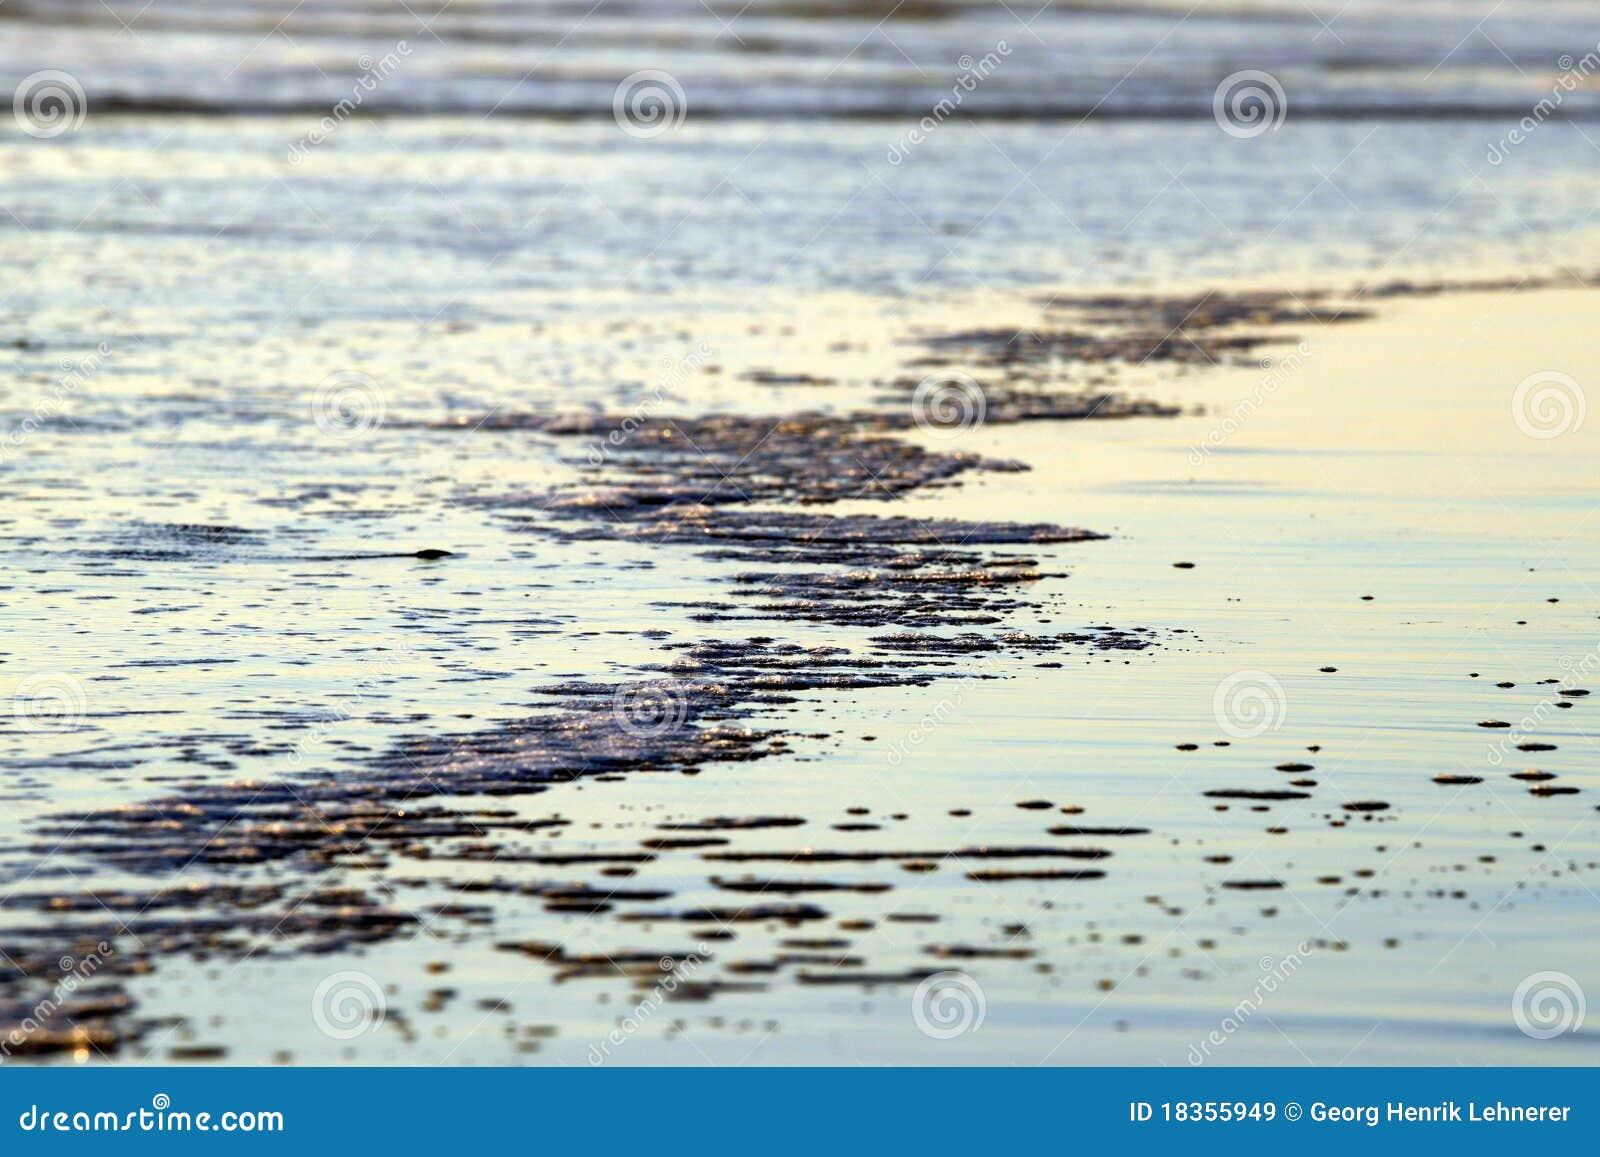 Strandvatten